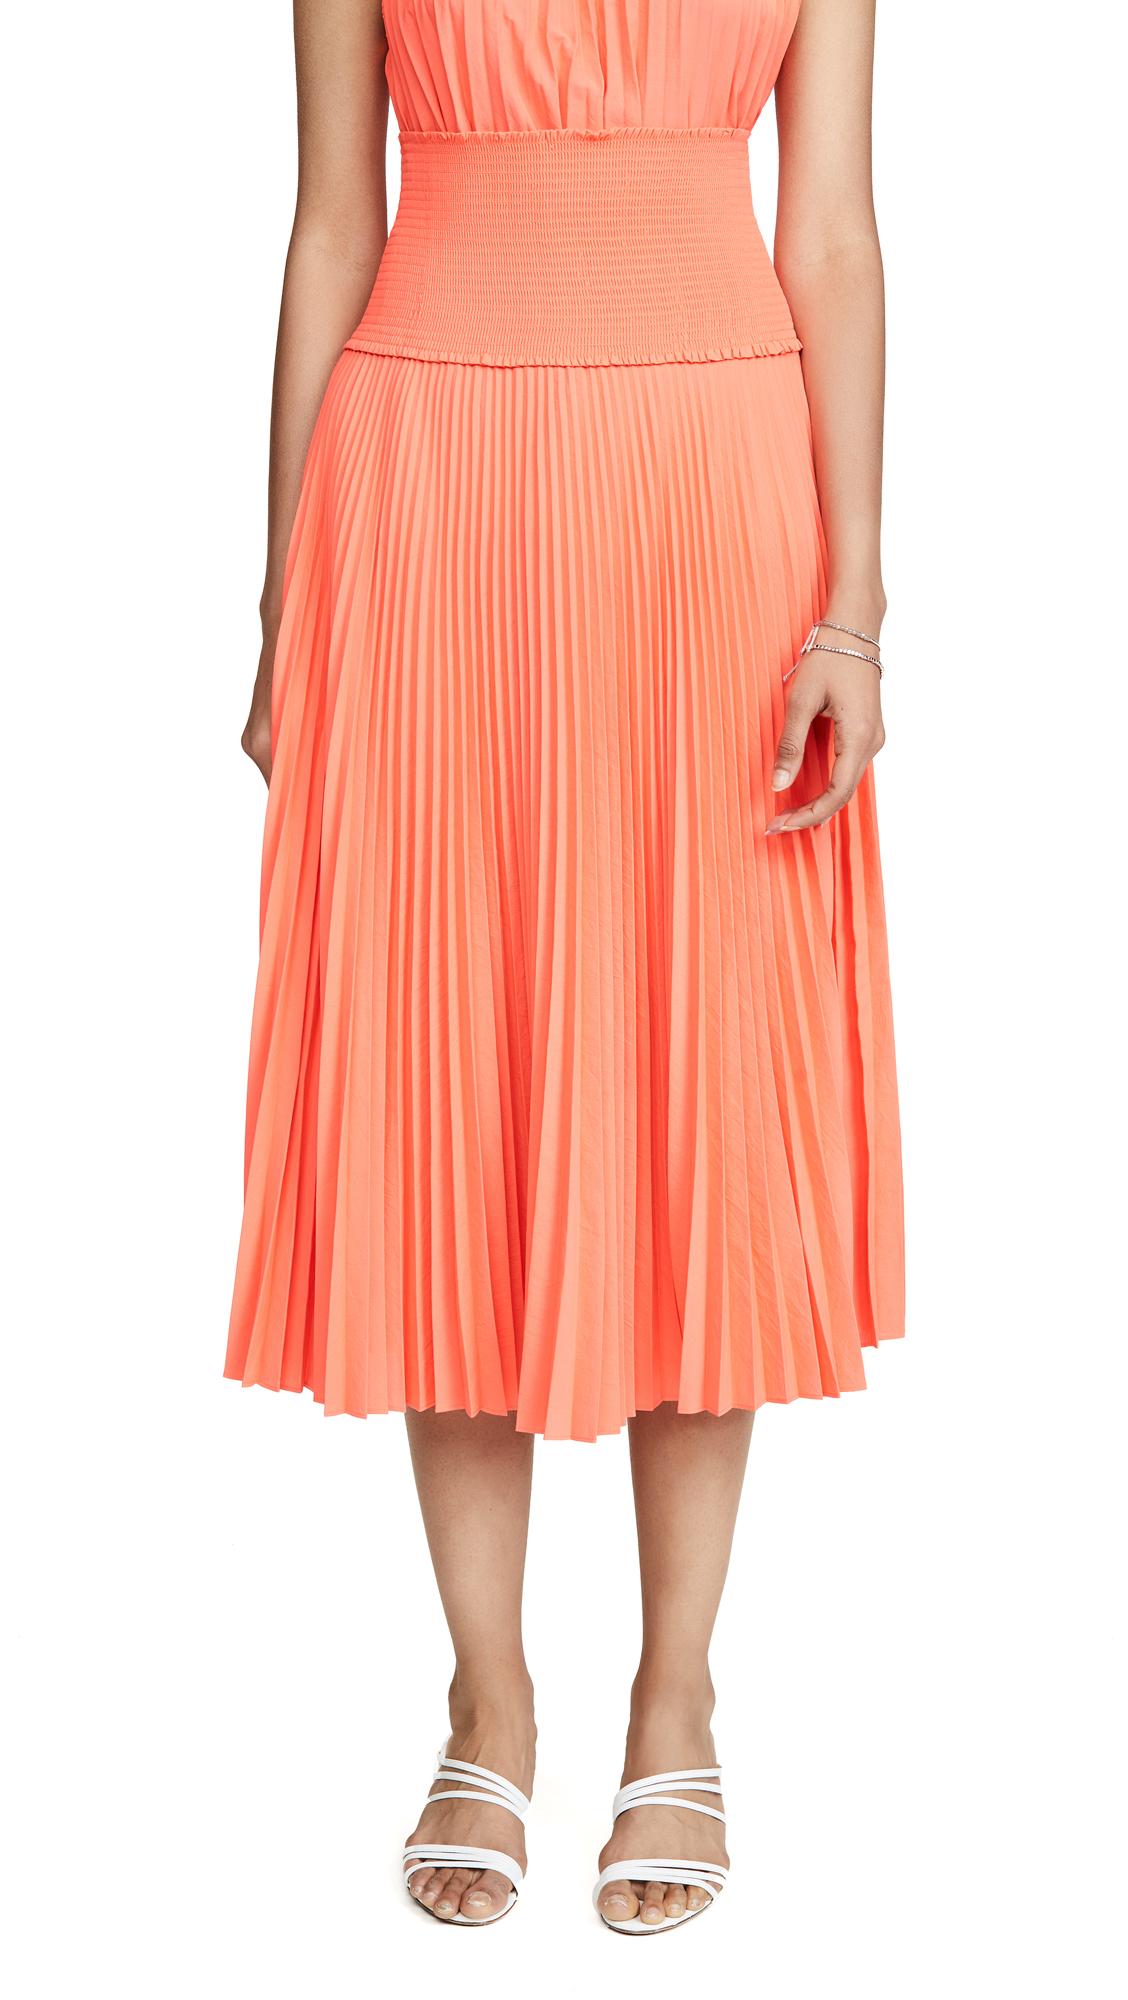 A.L.C. Hedrin Skirt - Neon Orange